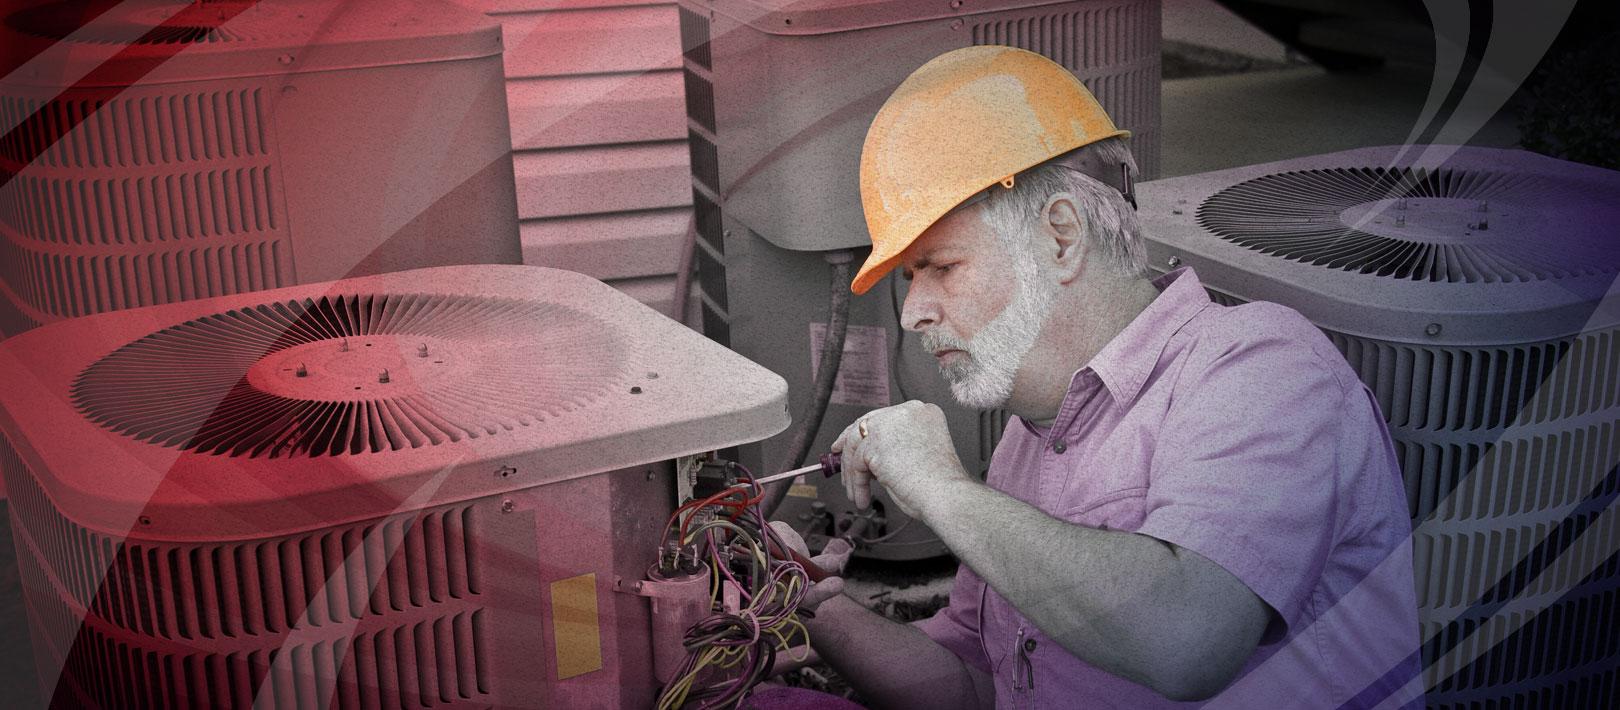 HVAC tech repairing AC unit in Edmond, OK